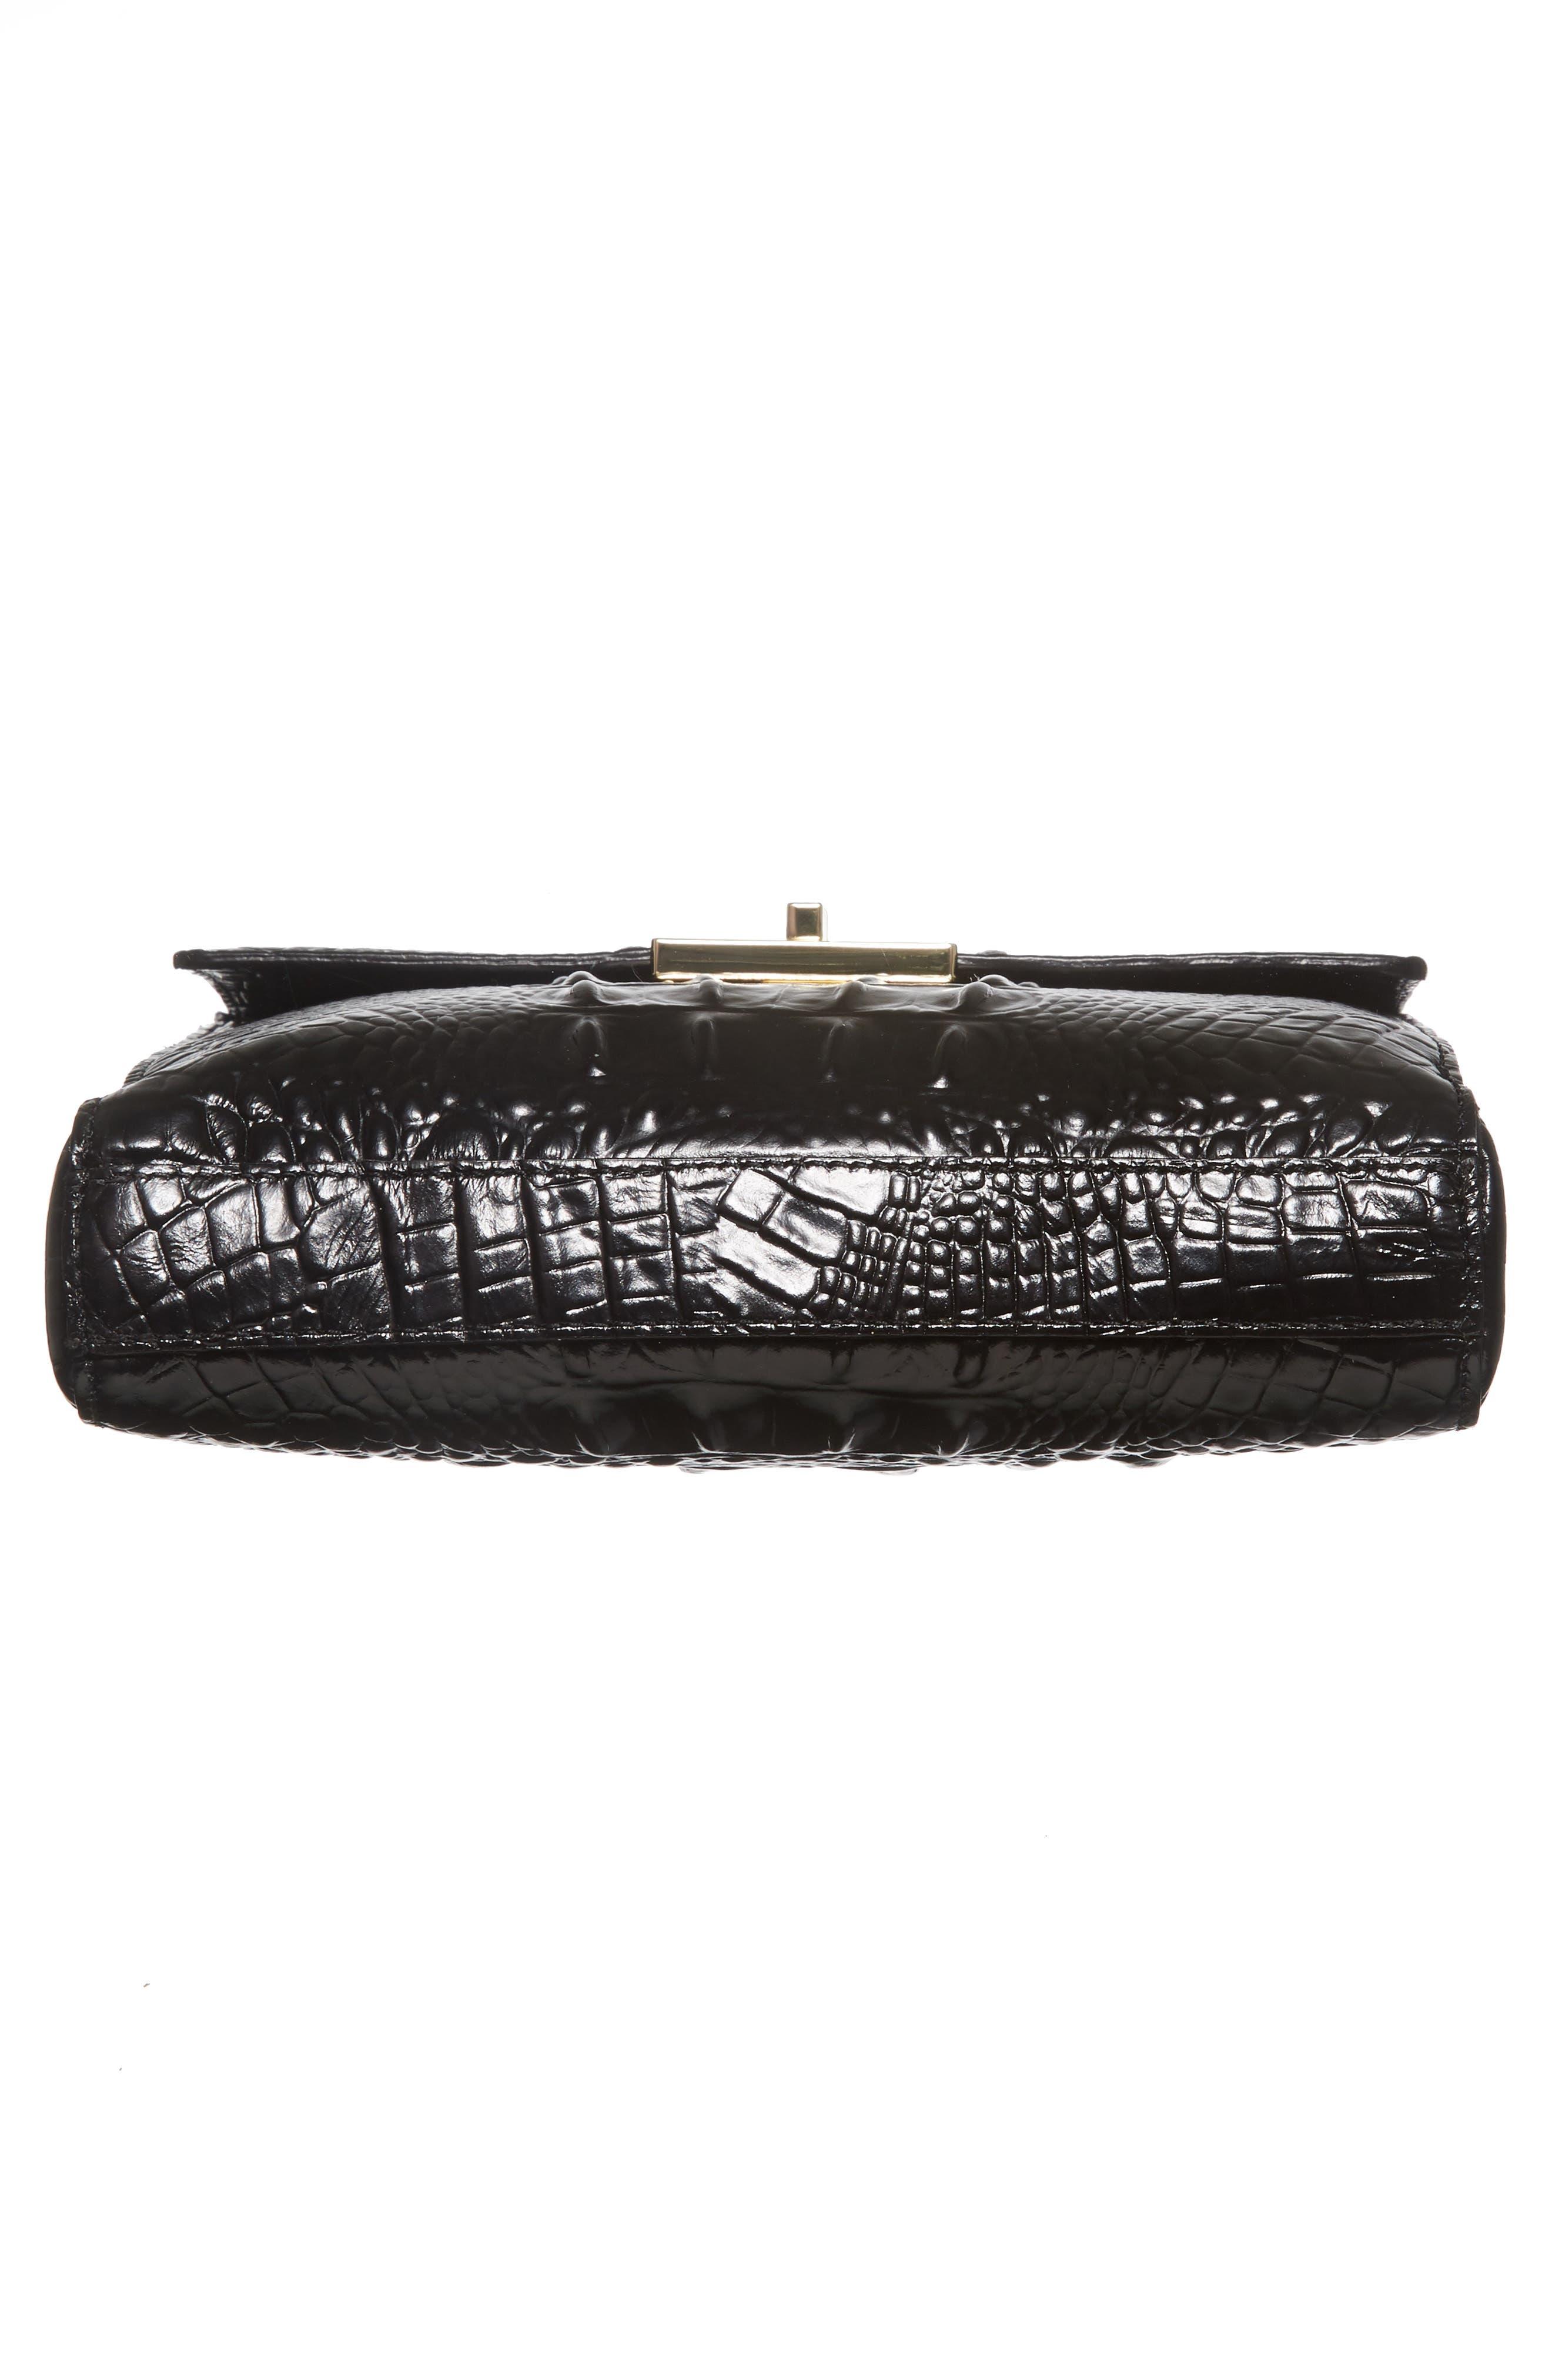 Melbourne Manhattan Croc Embossed Leather Crossbody Bag,                             Alternate thumbnail 6, color,                             BLACK